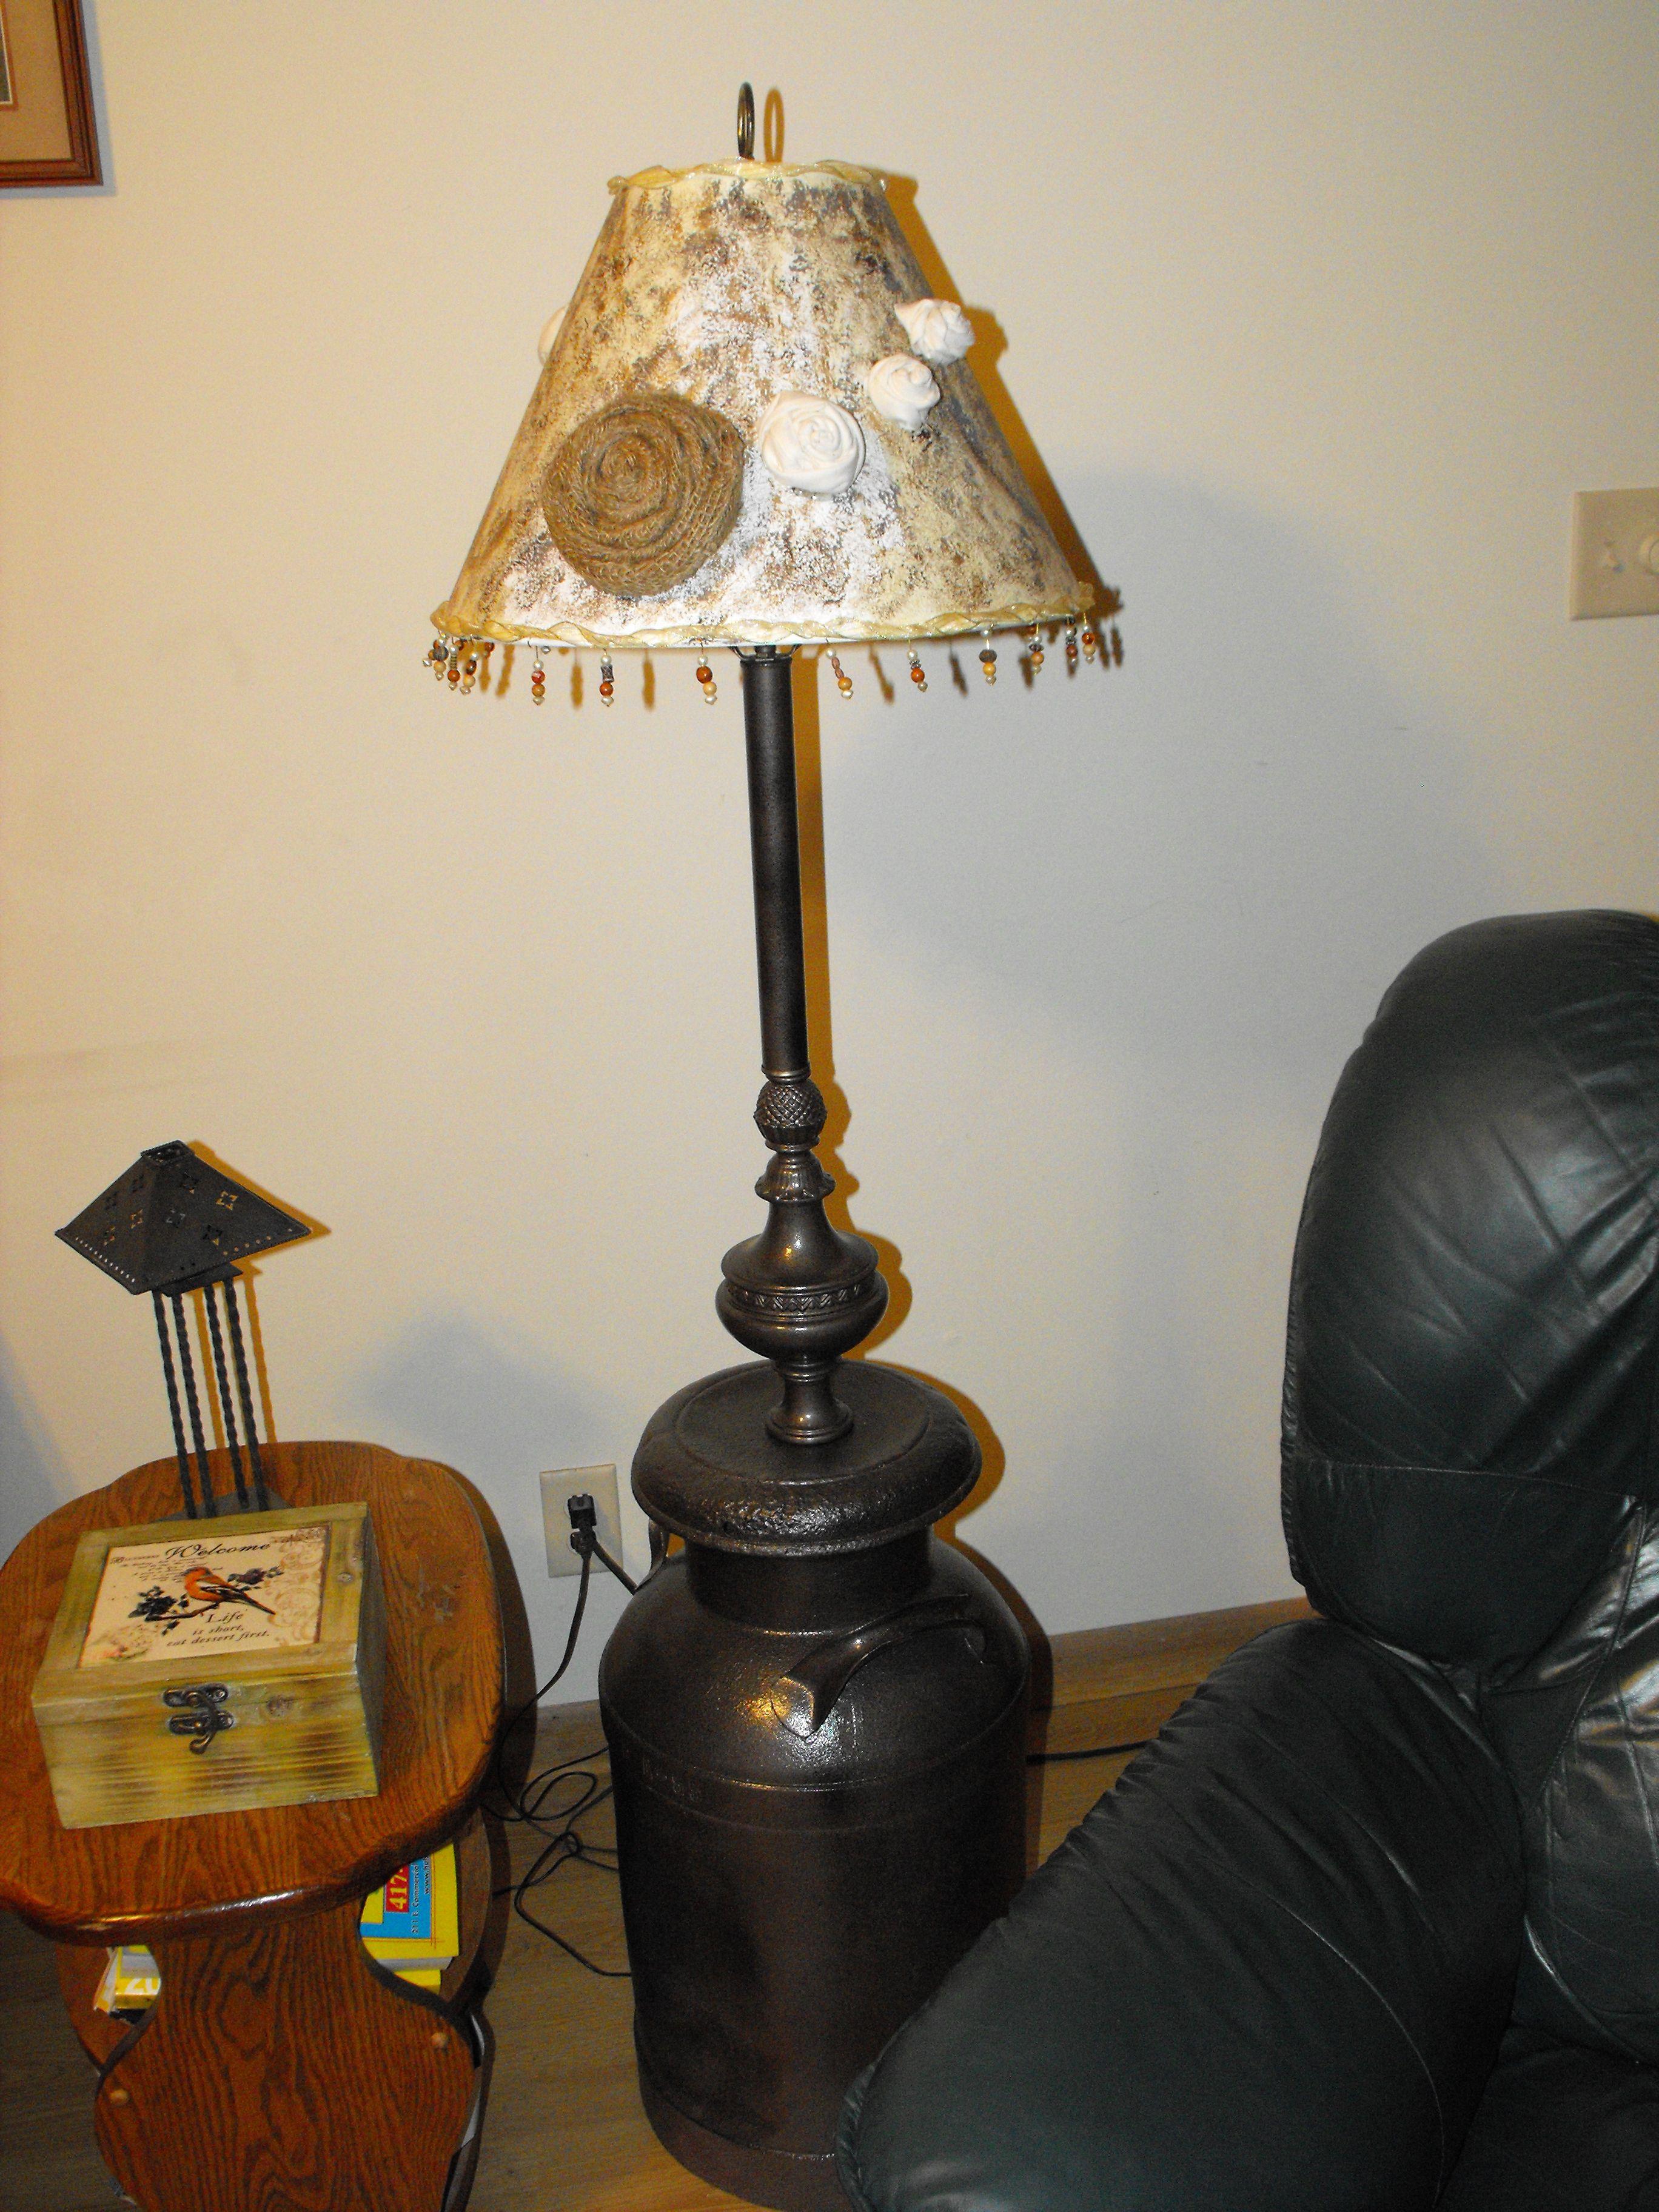 Antique Milk Can Transformed Into Floor Lamp Lamp Decor Lamp Wooden Lamps Design